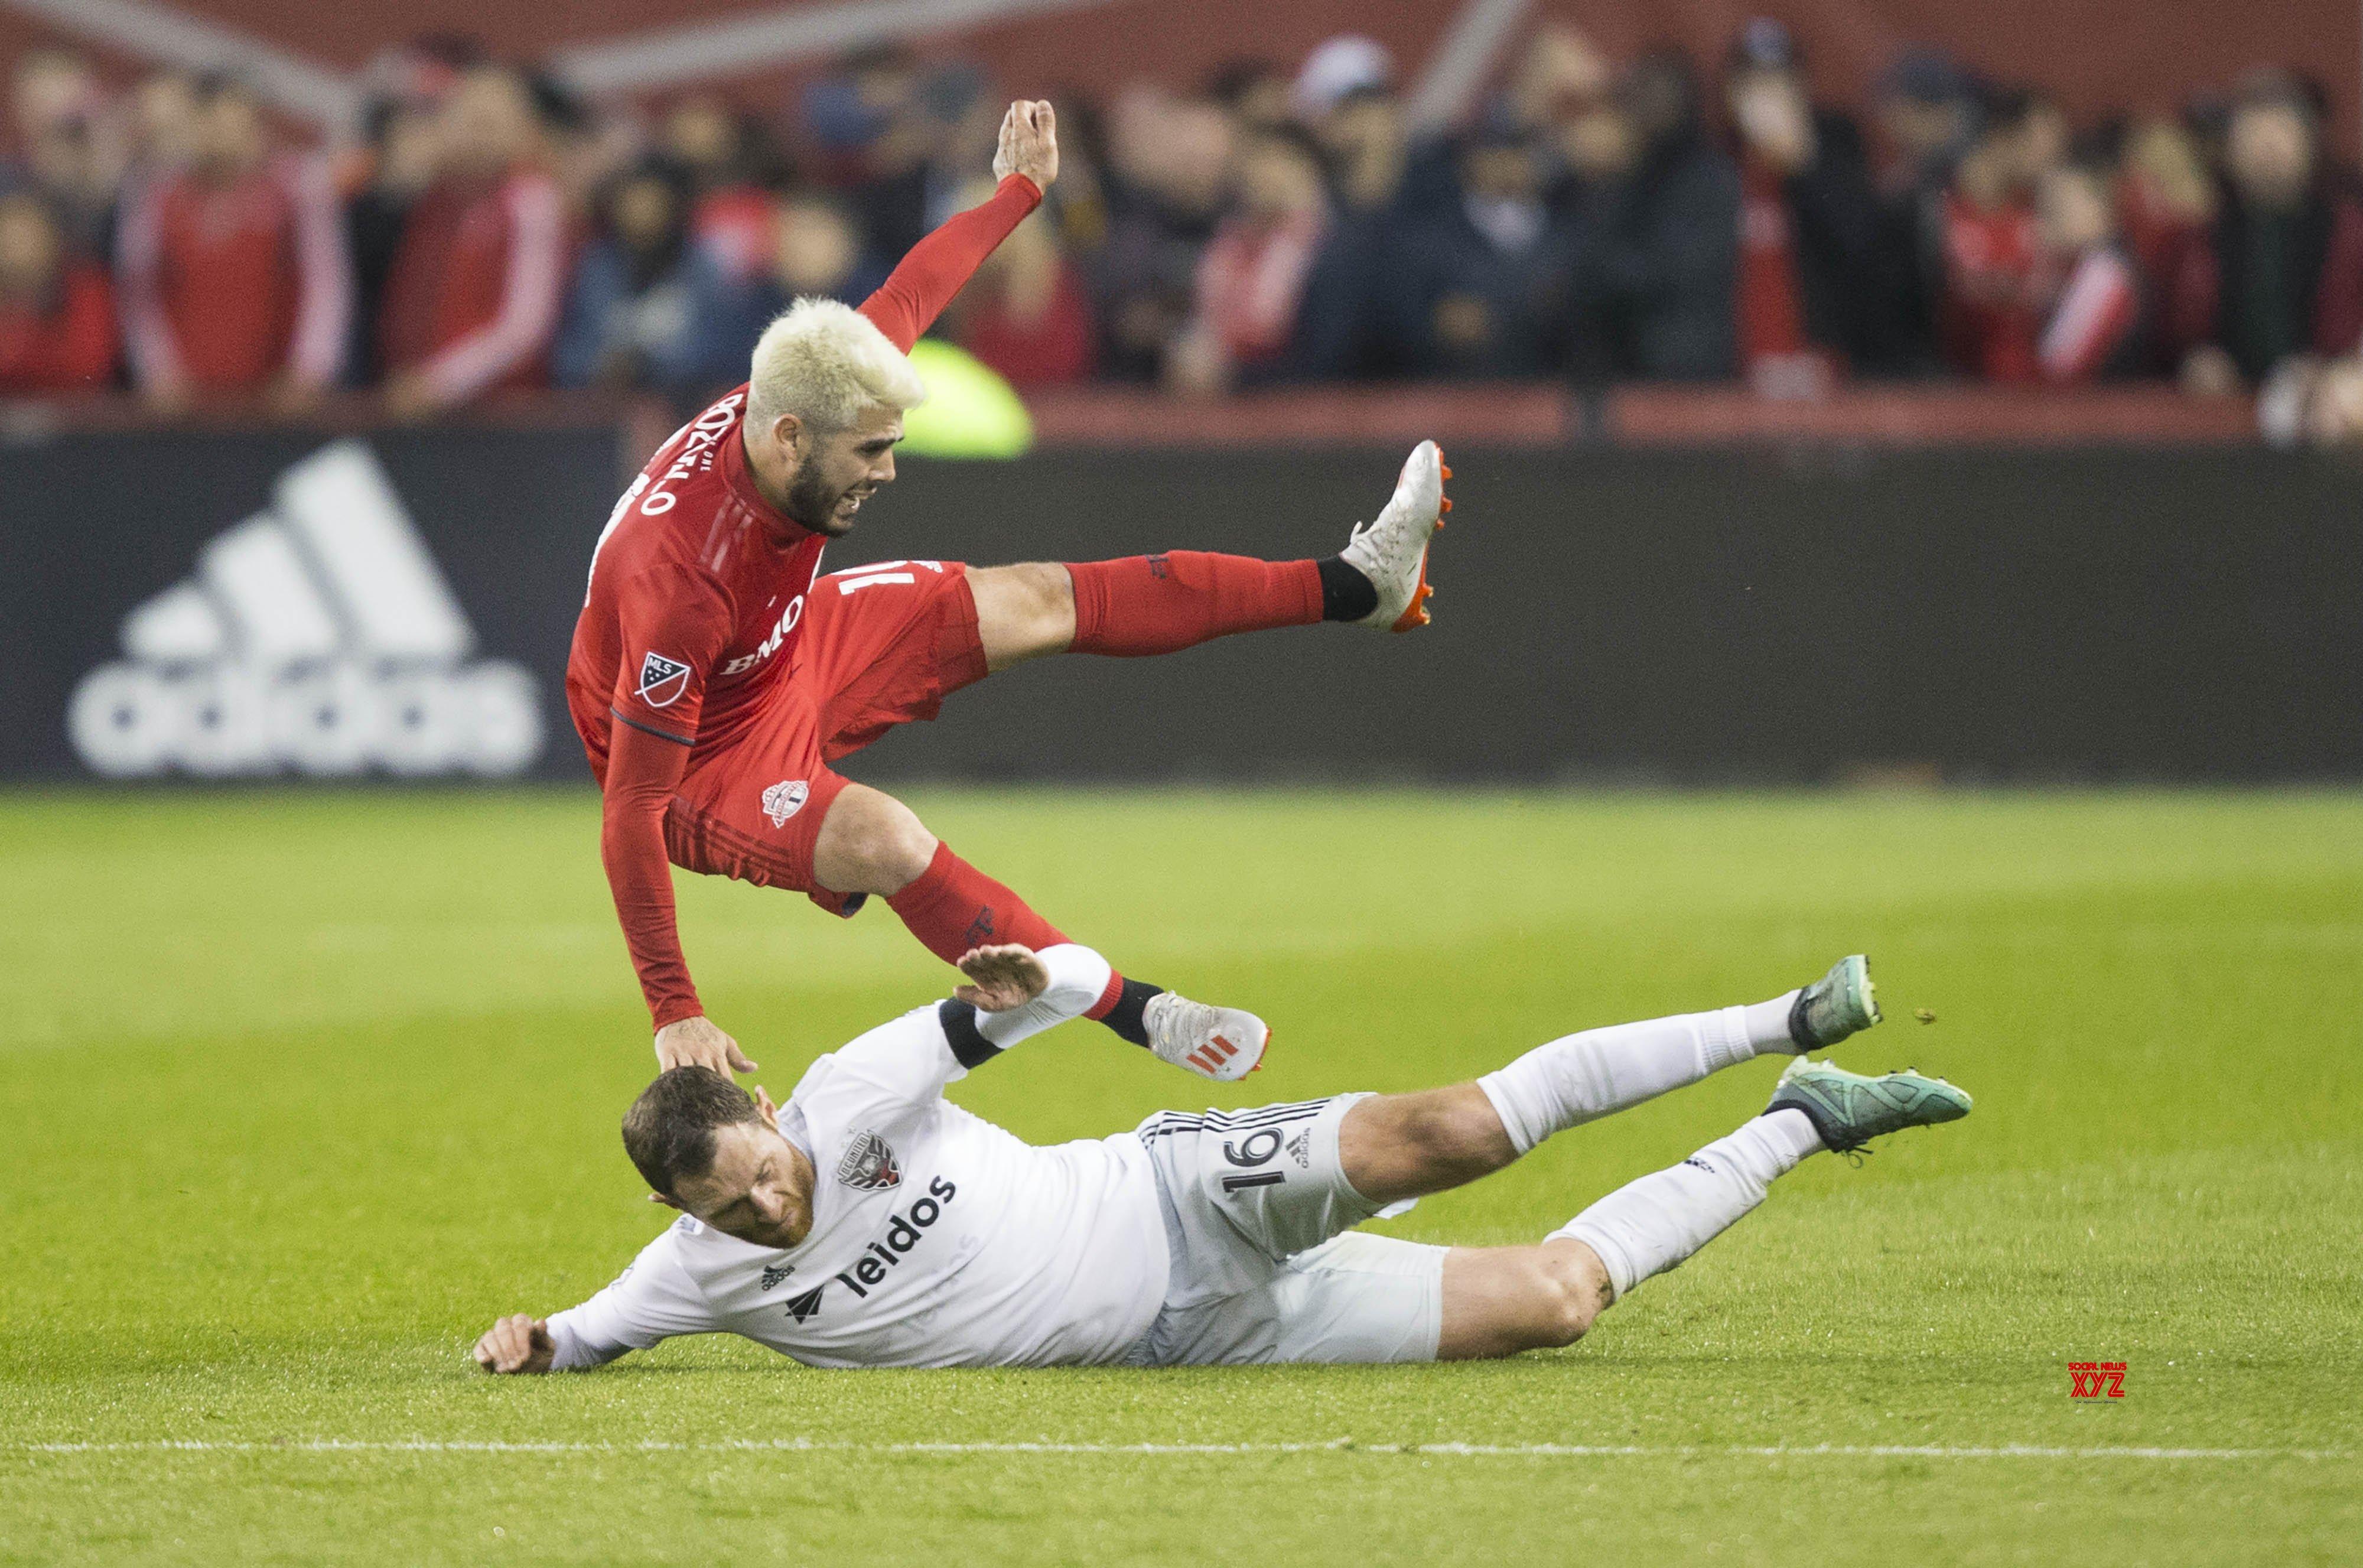 CANADA - TORONTO - SOCCER - MLS - TORONTO FC VS D.C. UNITED #Gallery